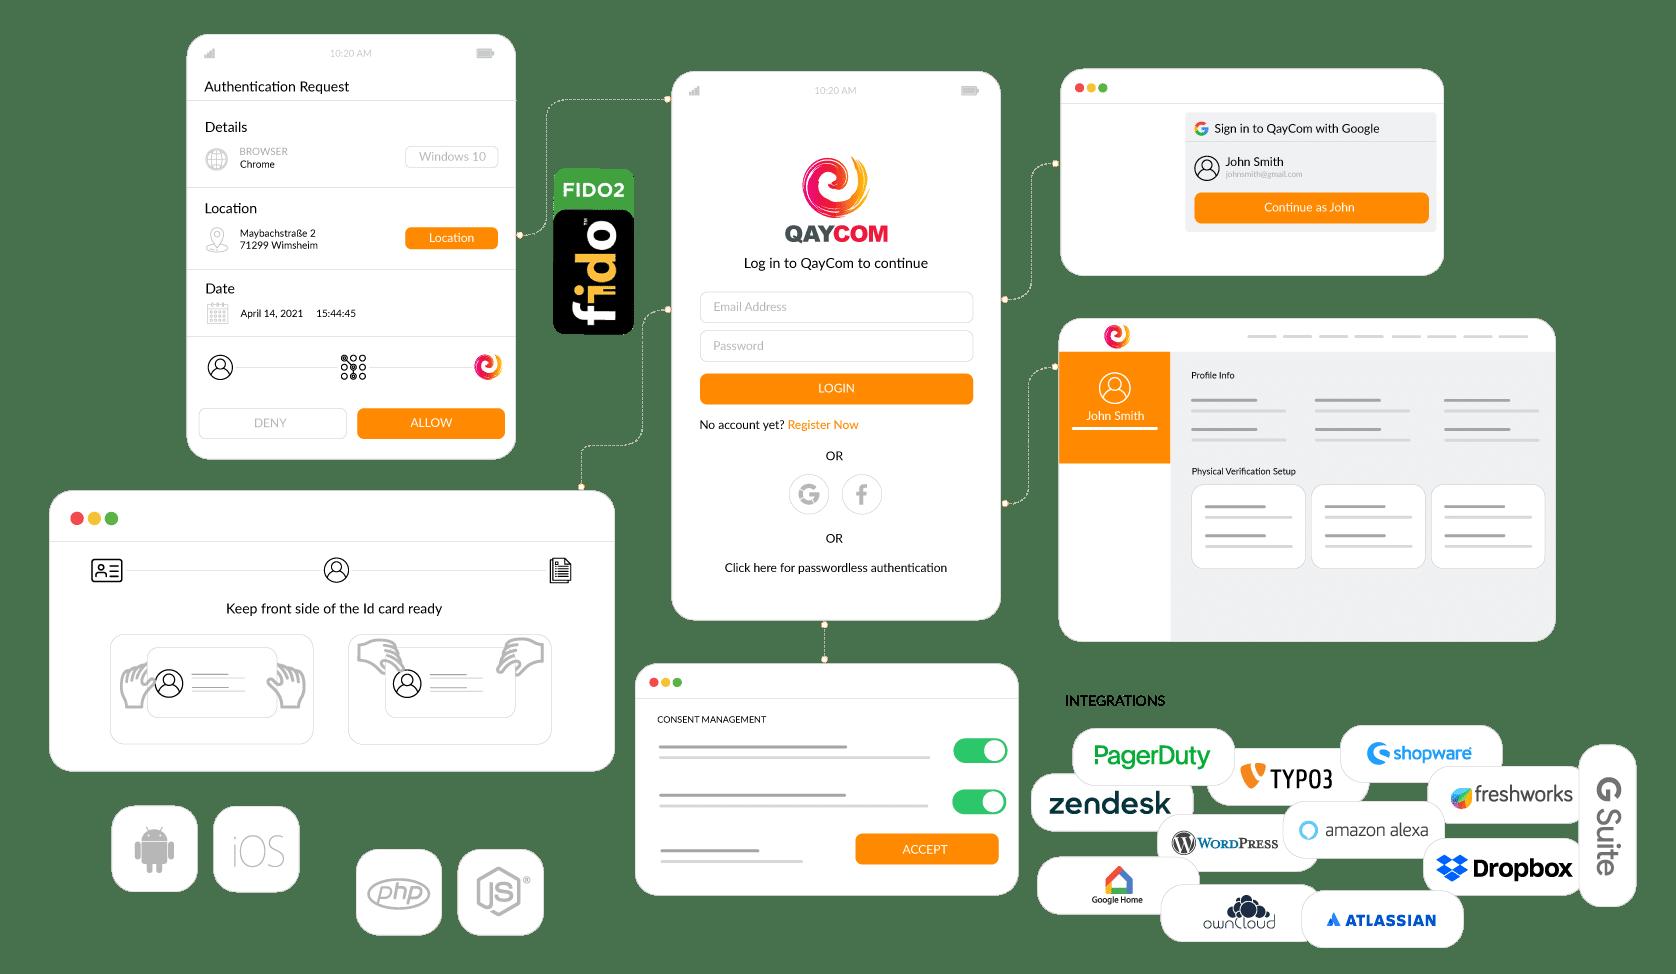 Die cidaas Identity Plattform